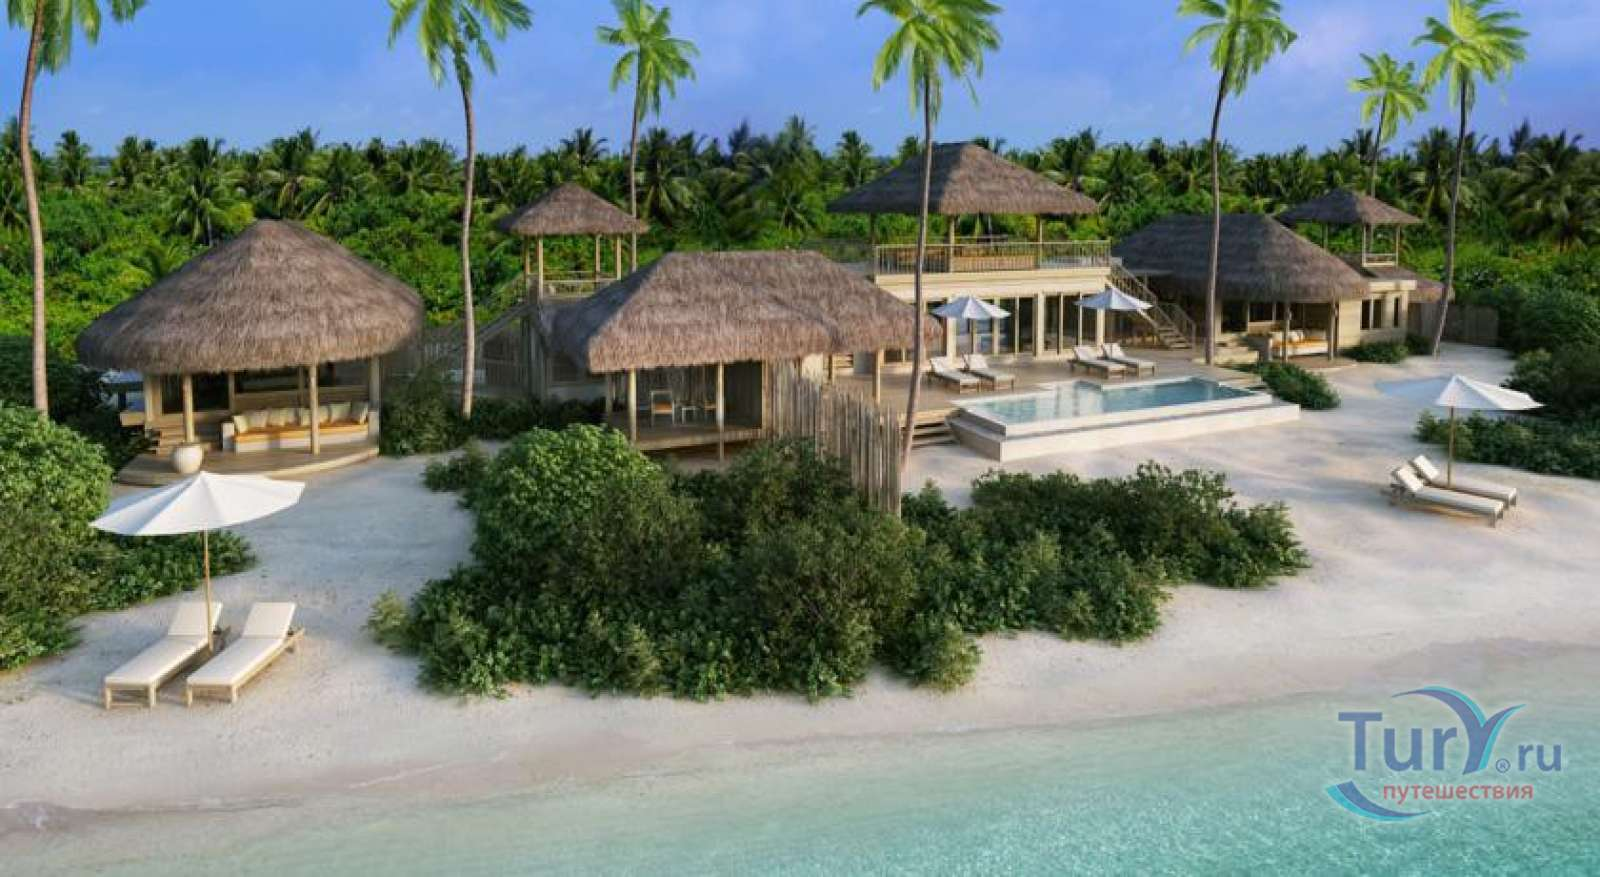 tur na maldivy laamu atoll 76 657 rub chel - Тур на Мальдивы Лааму Атолл 76 657 руб. чел.